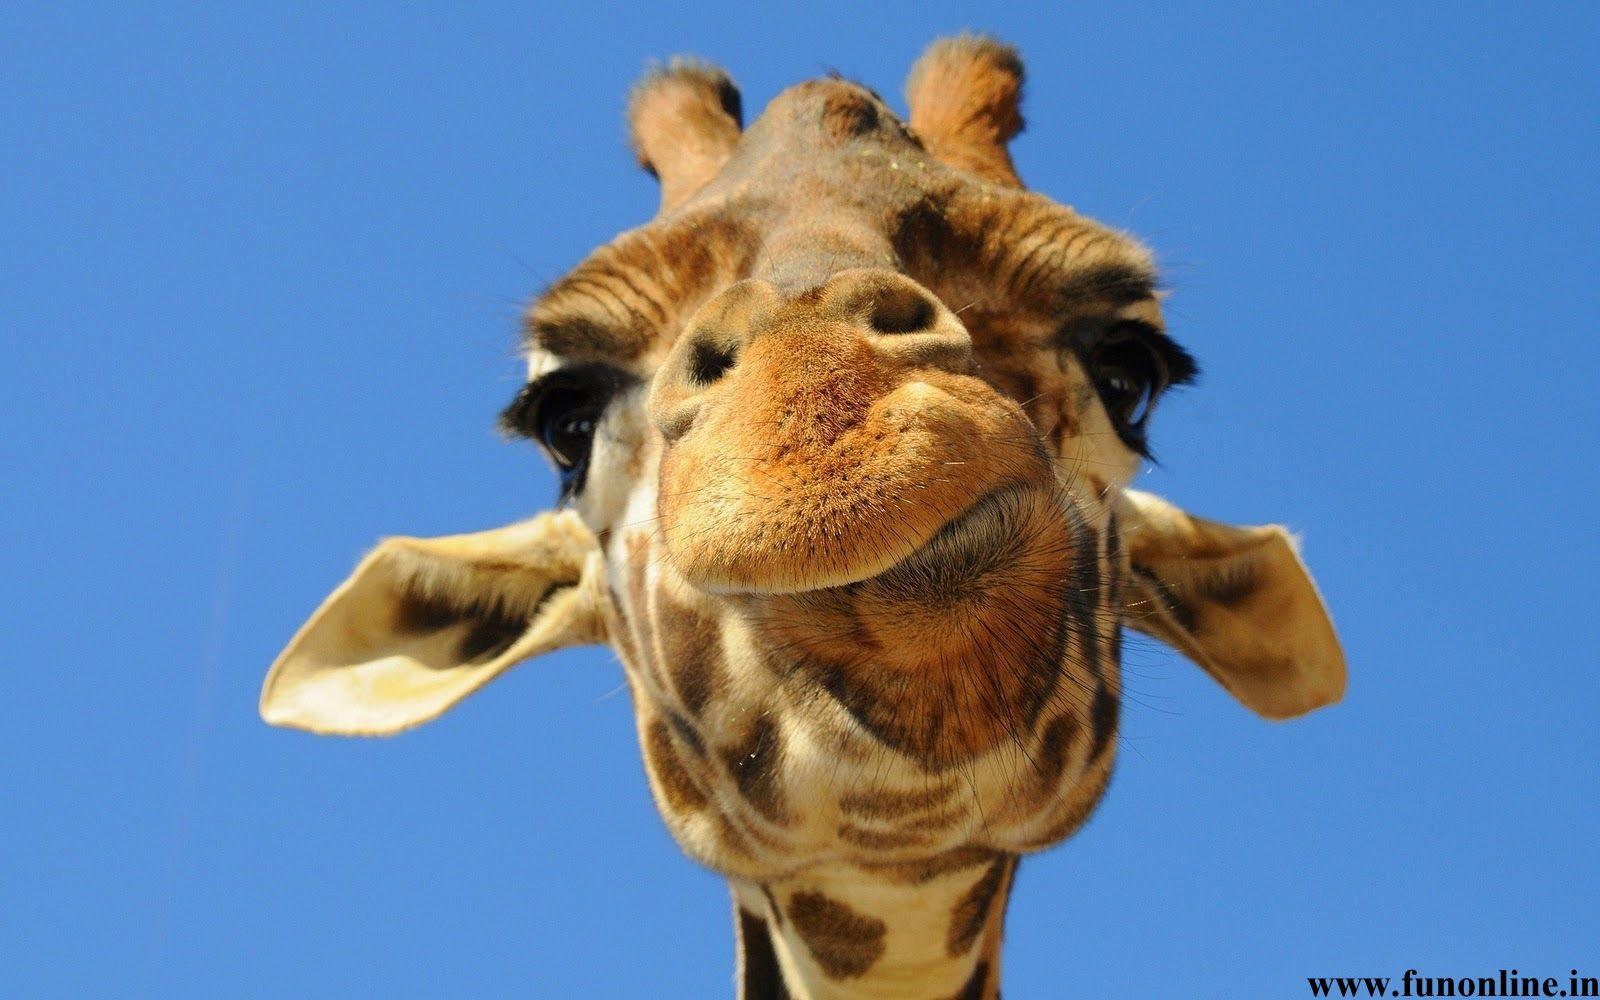 Funny Giraffe Giraffe Wallpapers Tallest Animal Giraffe